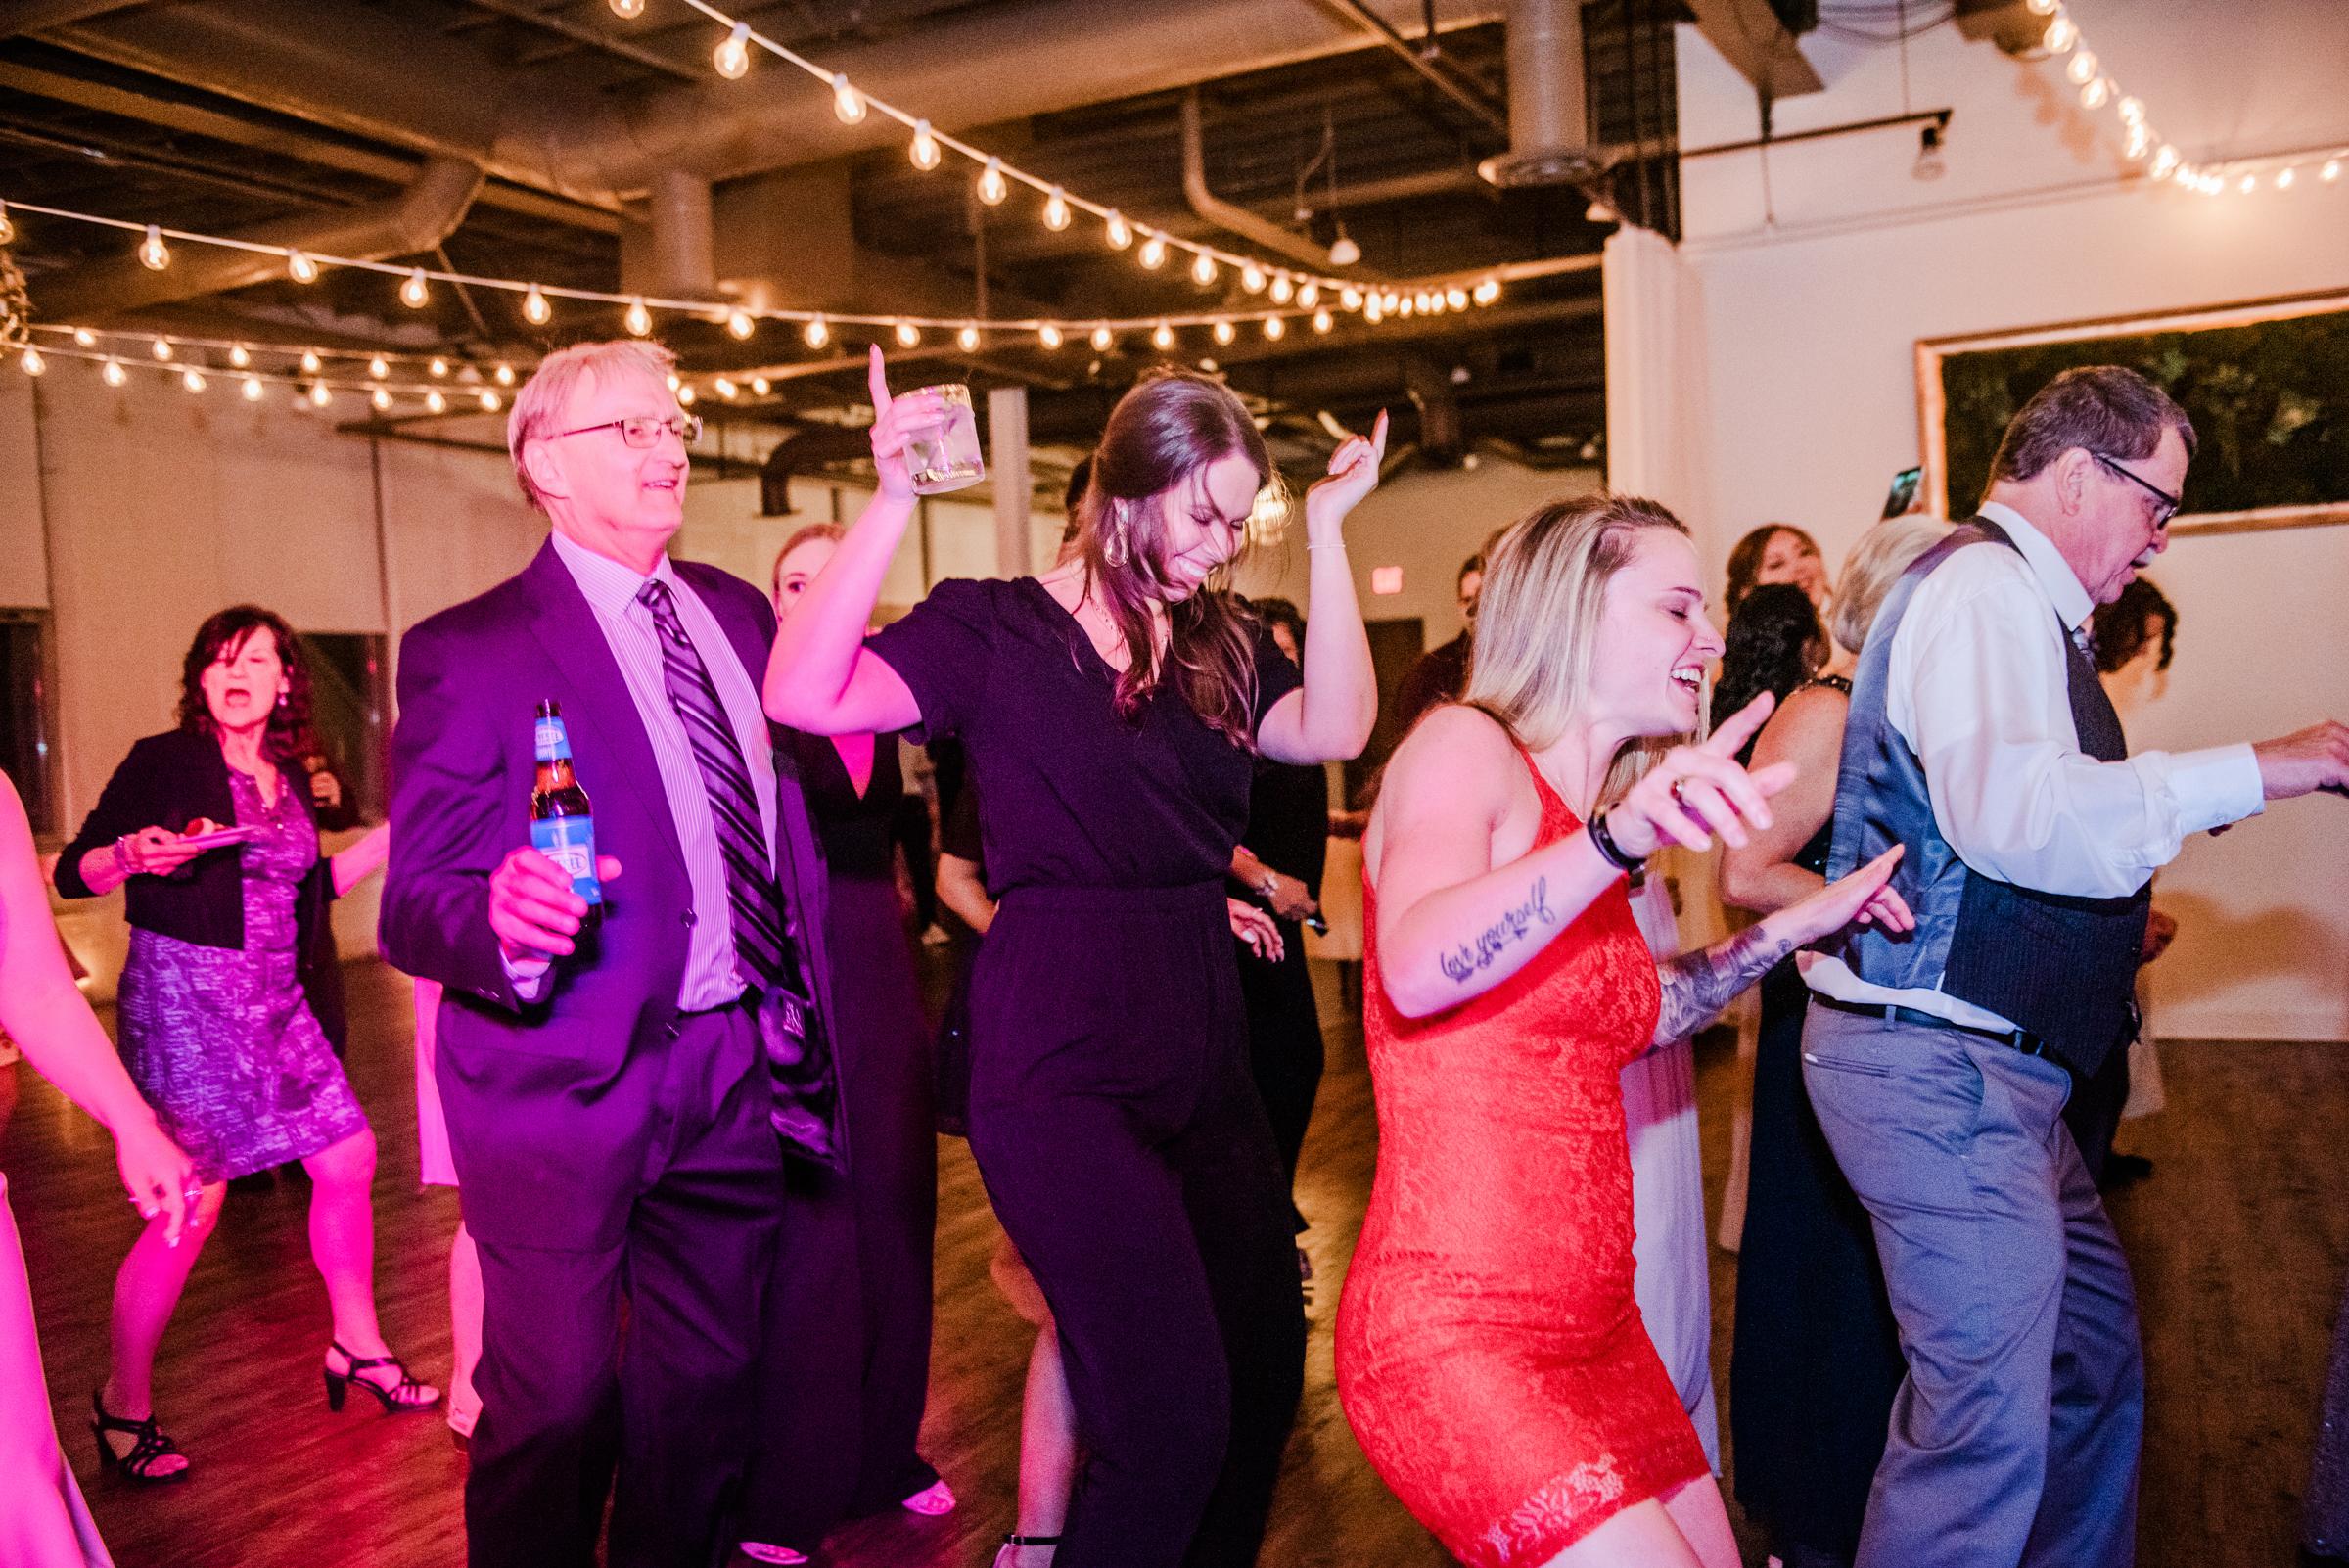 The_Arbor_LoftRochester_Wedding_JILL_STUDIO_Rochester_NY_Photographer_203113.jpg